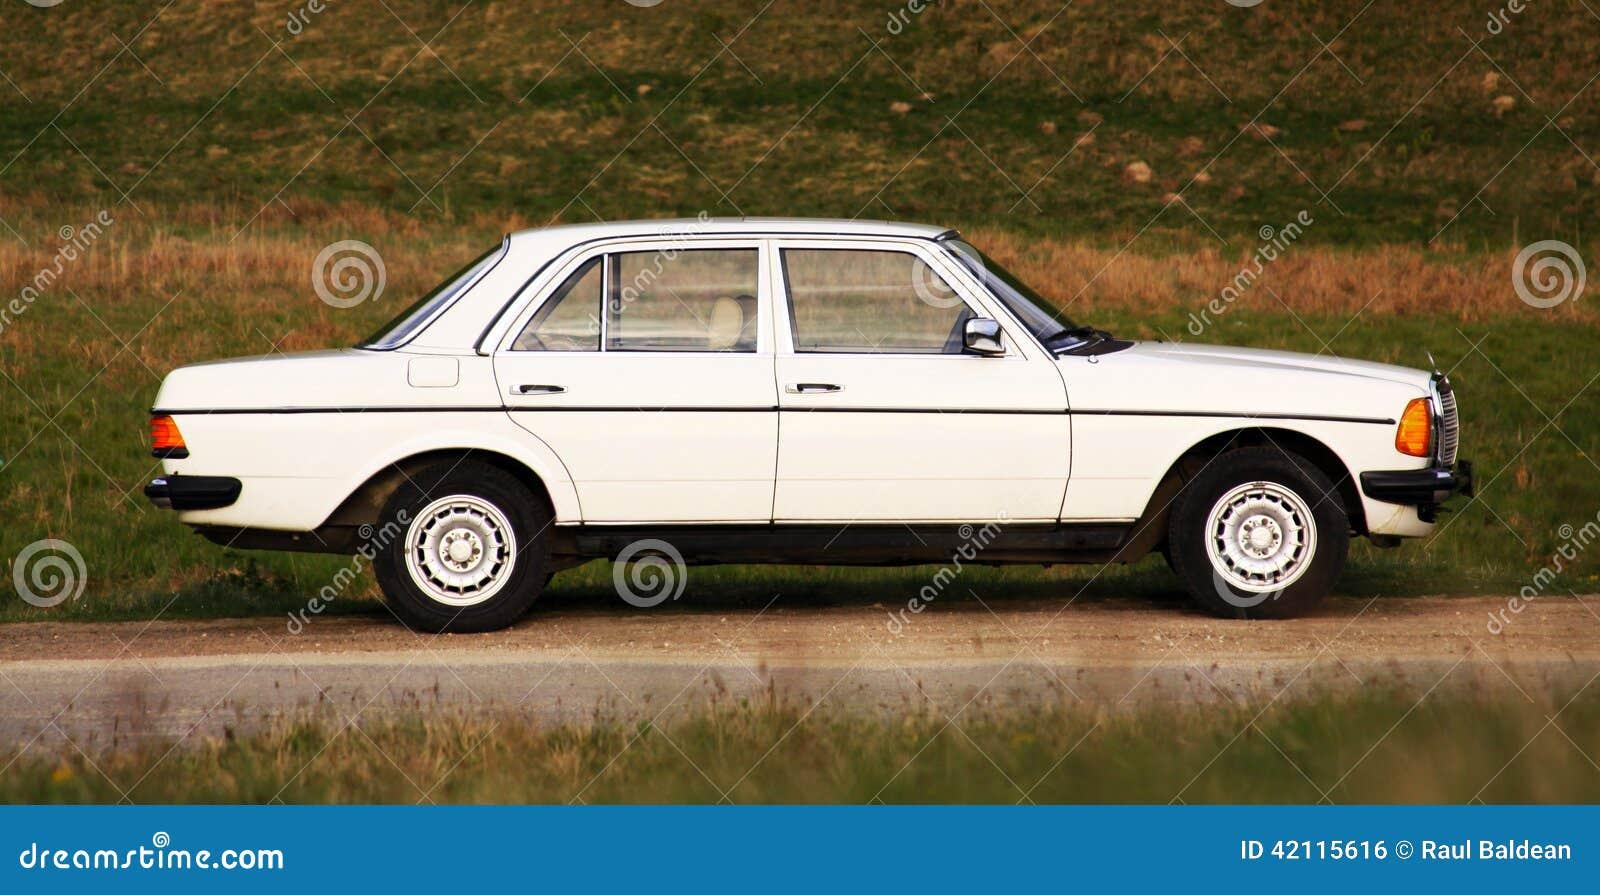 Мерседес-Benz W123 - кобра 240D